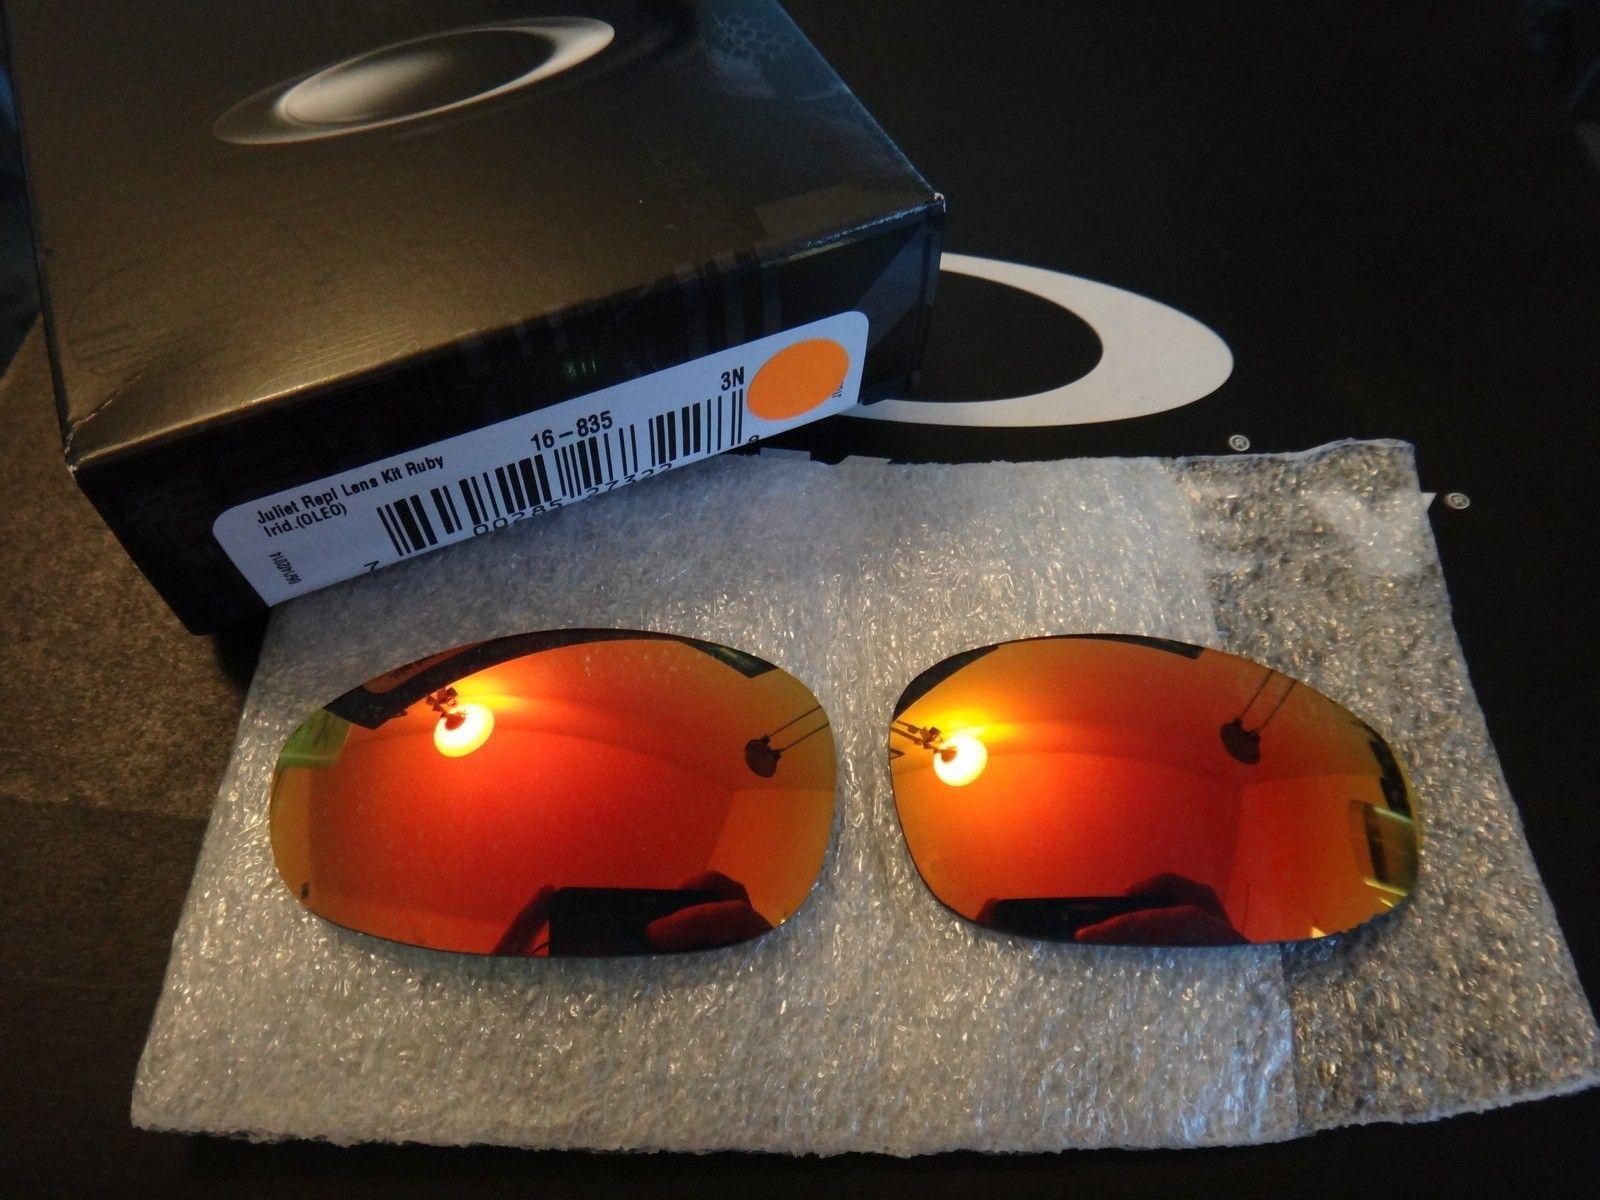 1st gen juliet, Juliet ruby lenses, snow goggle lens (A frame), juliet parts, wallet, boots - DSC07222.JPG